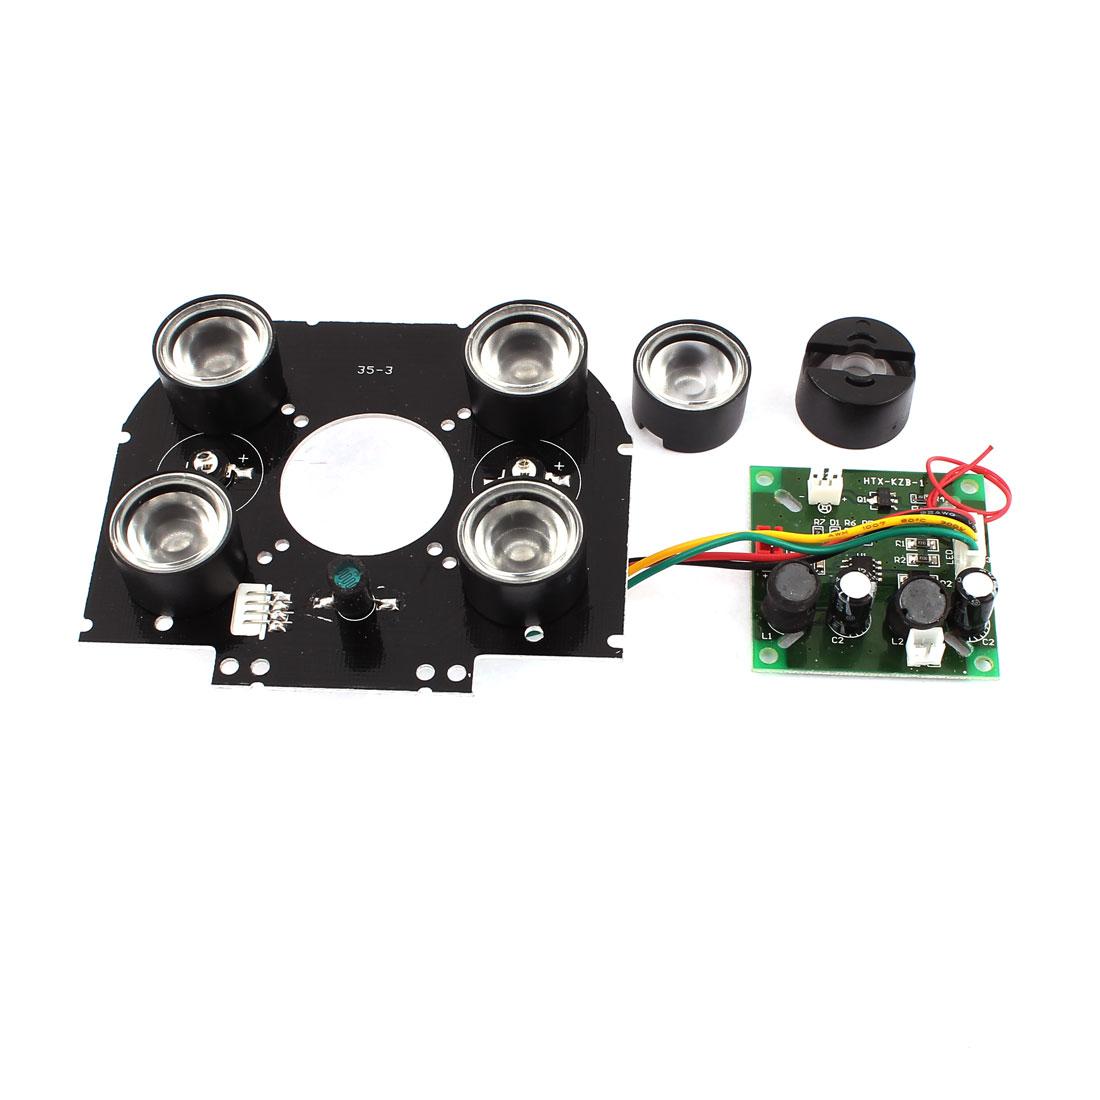 Array 6 High Power Infrared IR LED Light Board Module For CCTV Camera